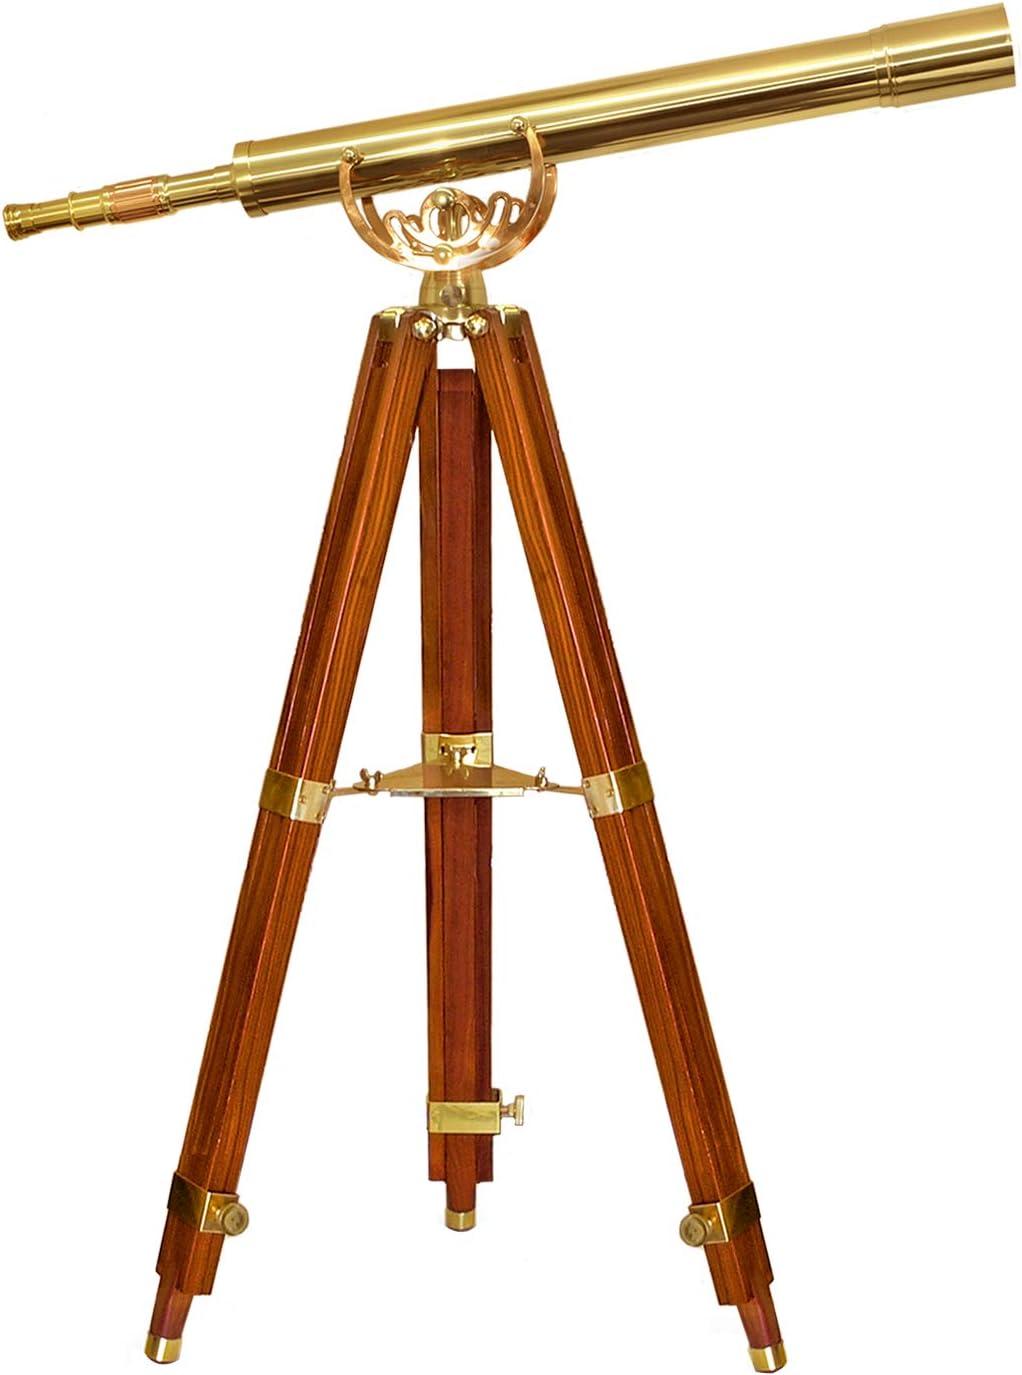 BARSKA AA10620 Anchormaster Classic Brass Telescope 32x80 with Mahogany Floor Tripod, Gold